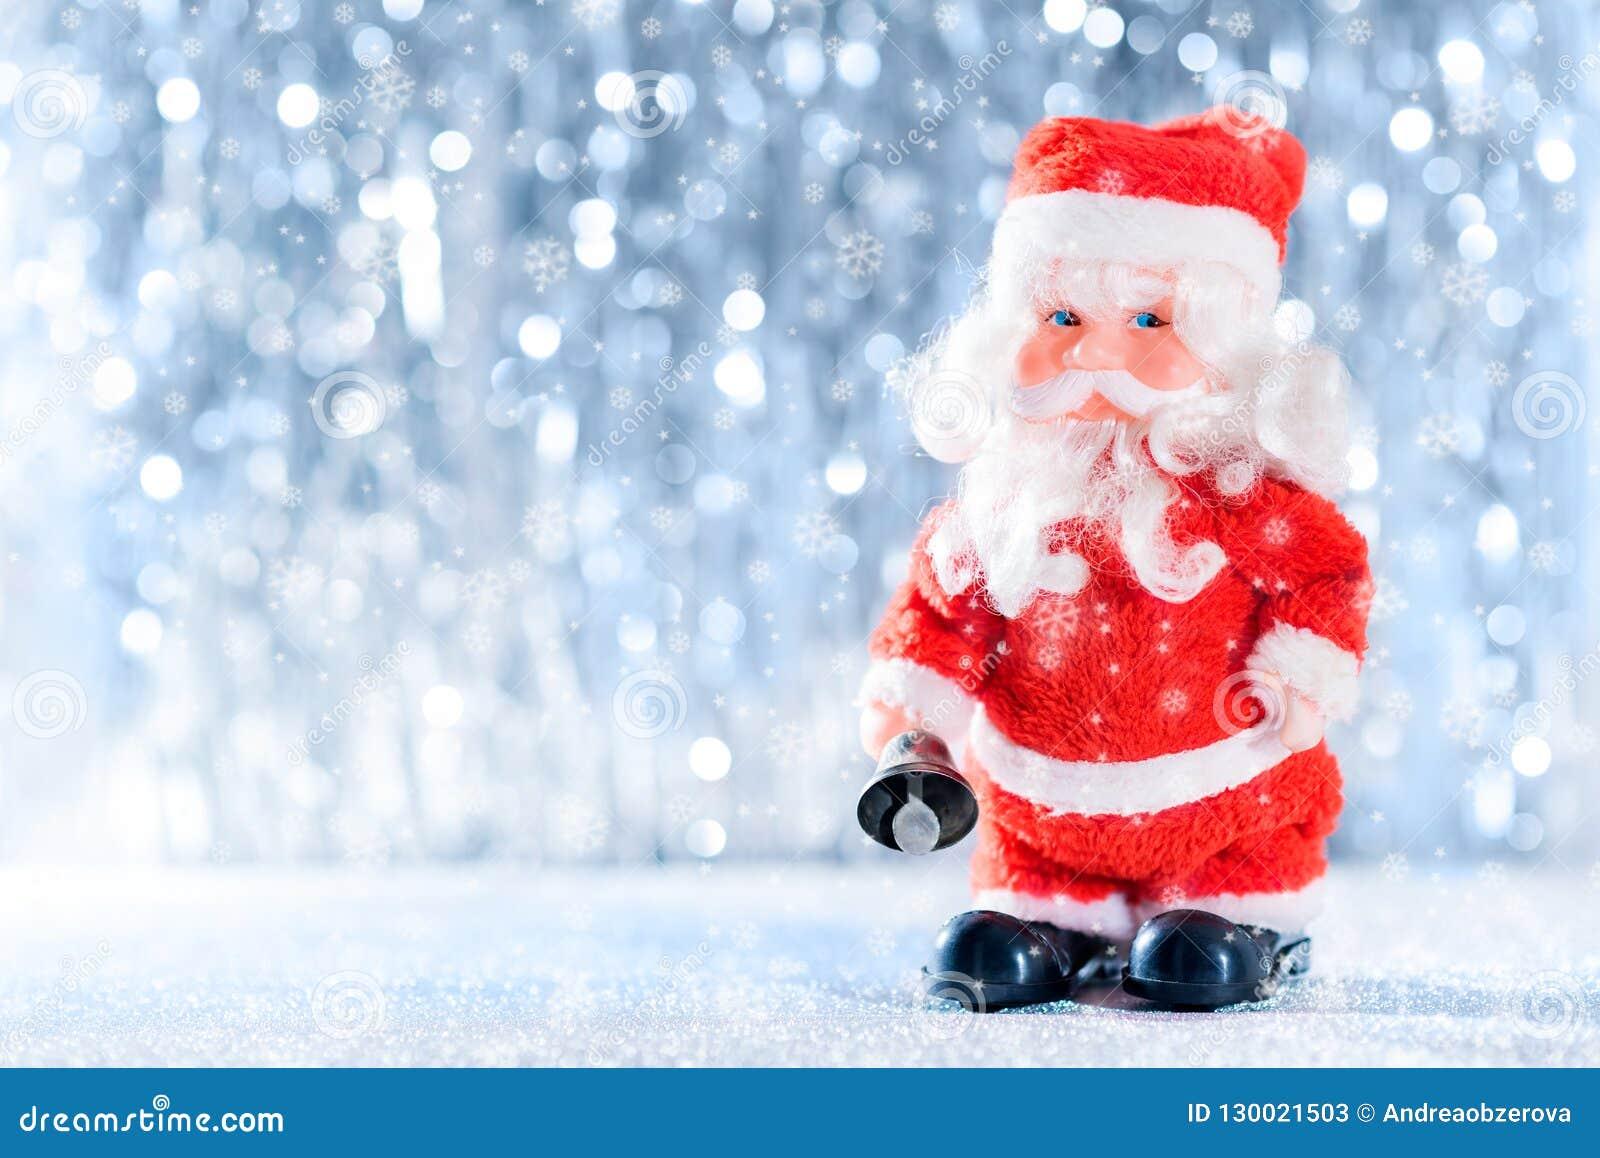 Cute Santa Clause in Winter Wonderland. Christmas background.